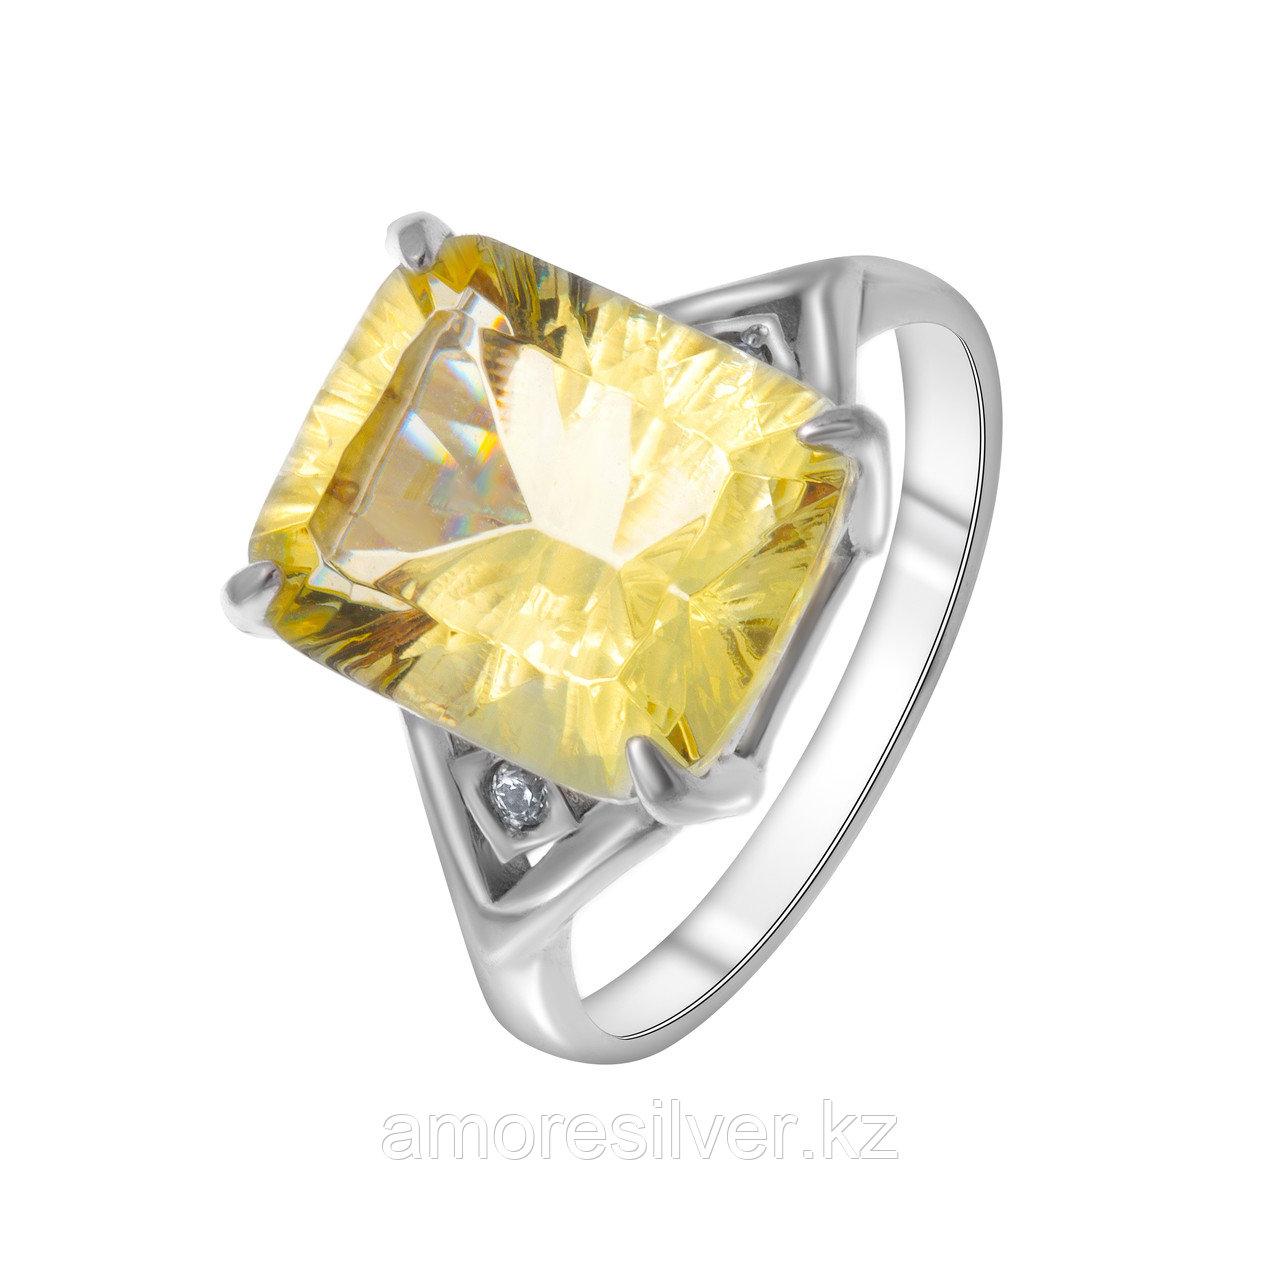 "Кольцо Алмаз-Групп серебро с родием, кварц пл. цитрин фианит, ""halo"" 11260087"